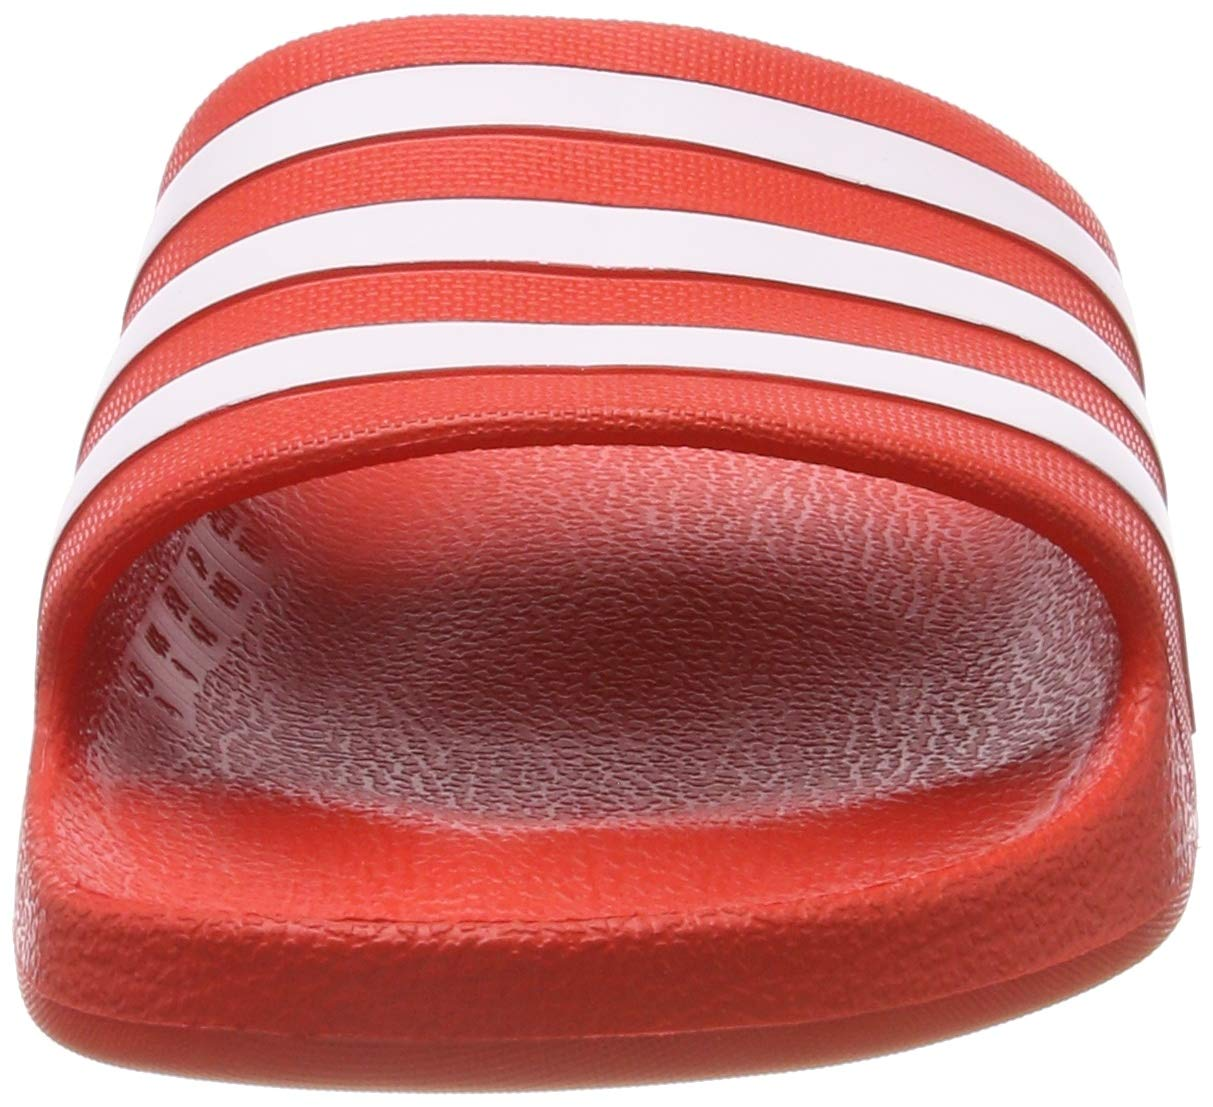 Adidas Adilette Aqua Scarpe da Spiaggia e Piscina Unisex - Adulto 4 spesavip